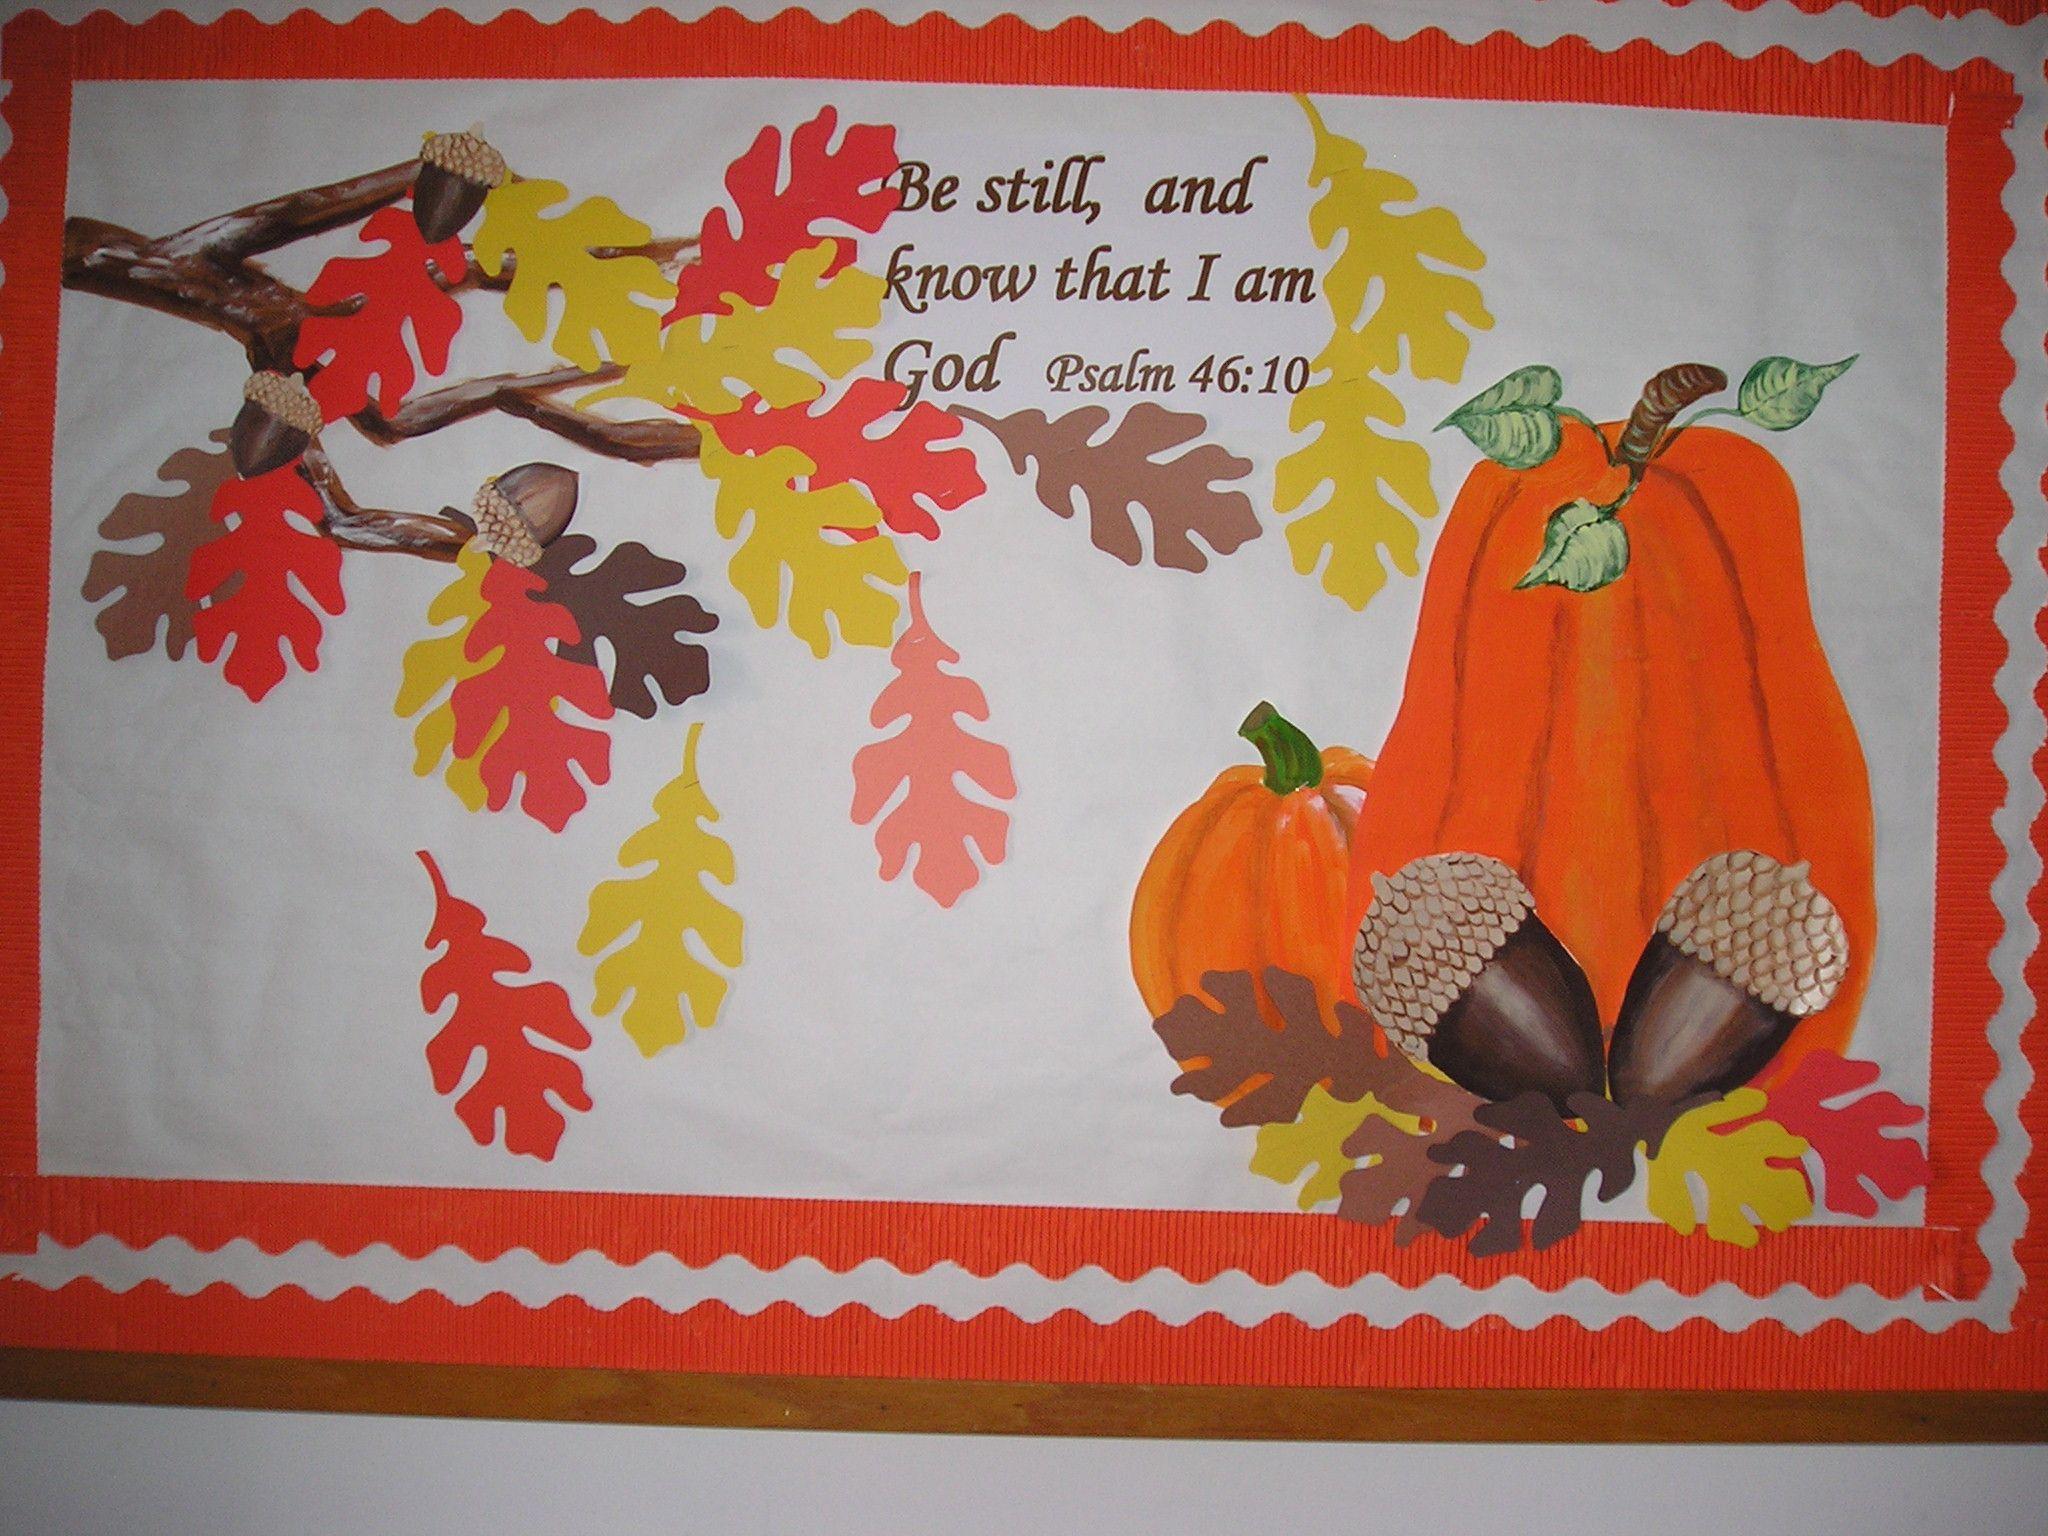 Fall Bulletin Board Ideas for Churches